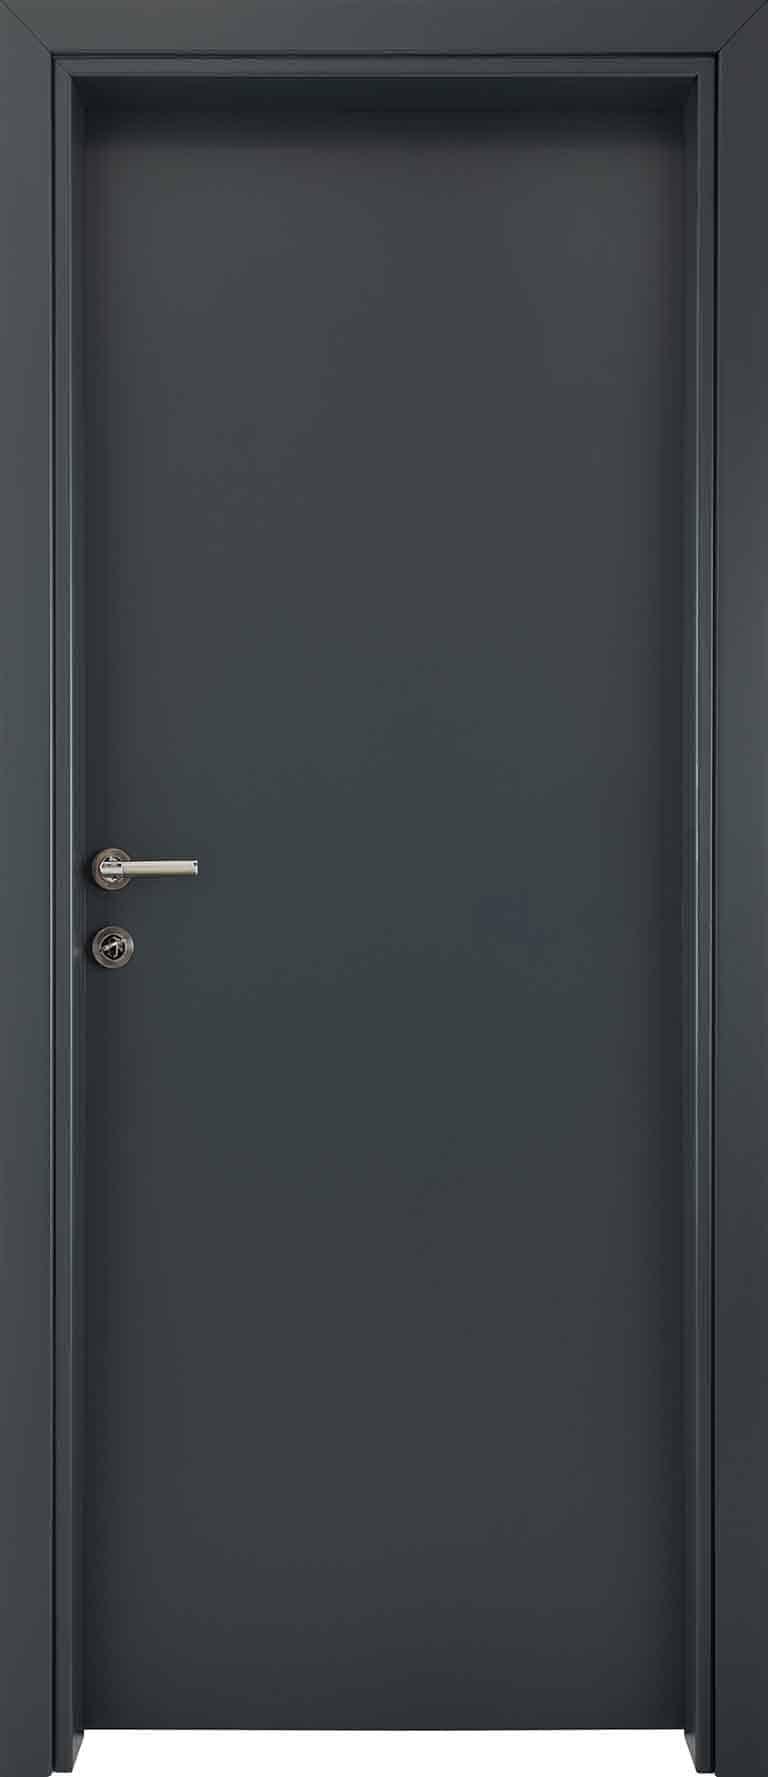 protuprovalna vrata forlux antracit lakirana